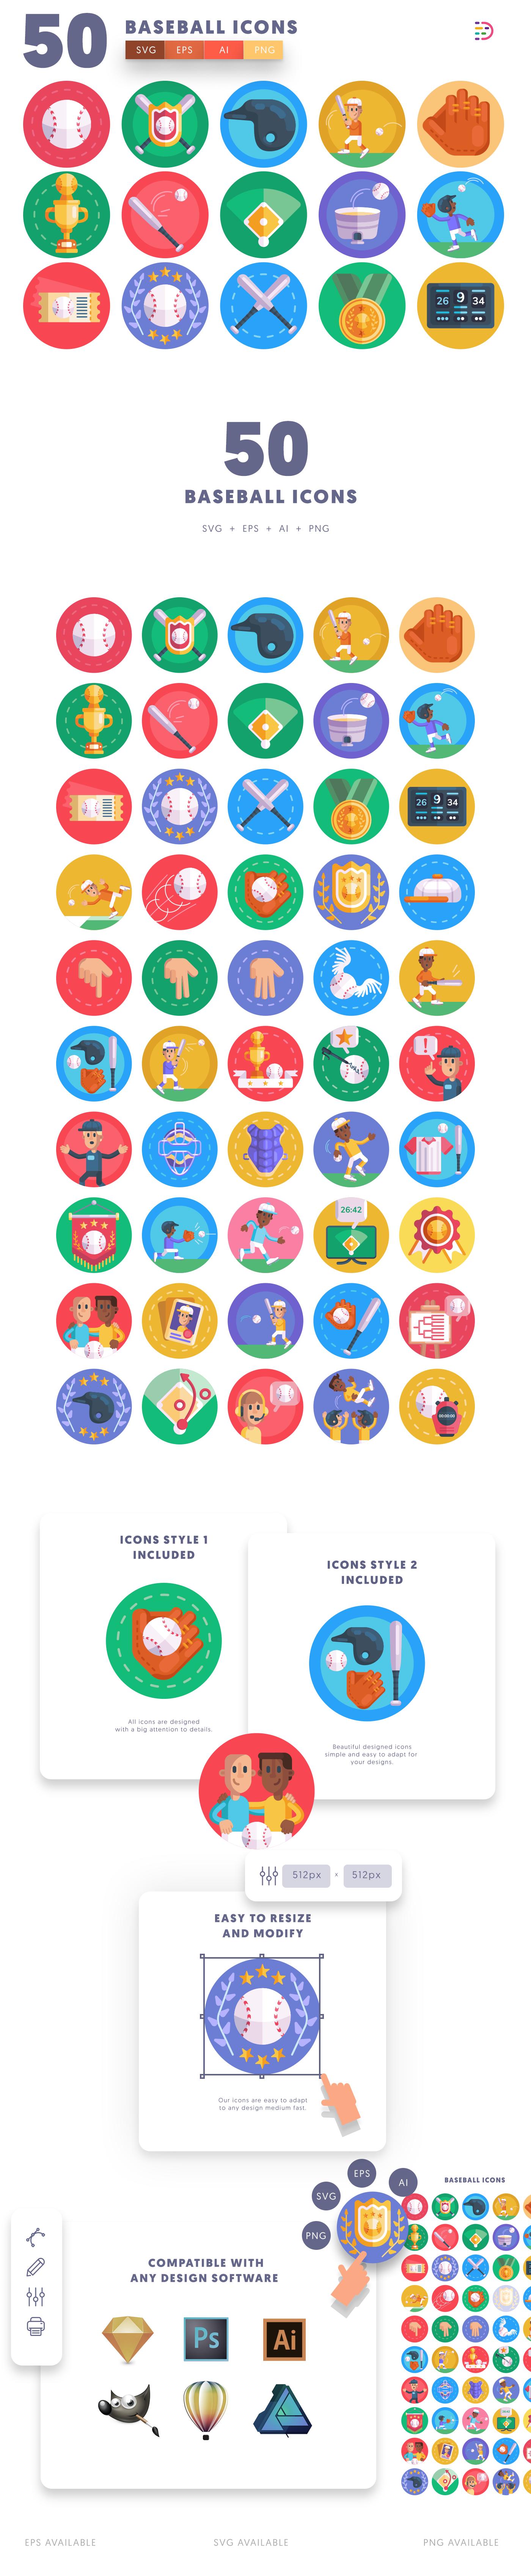 Baseball icons info graphic